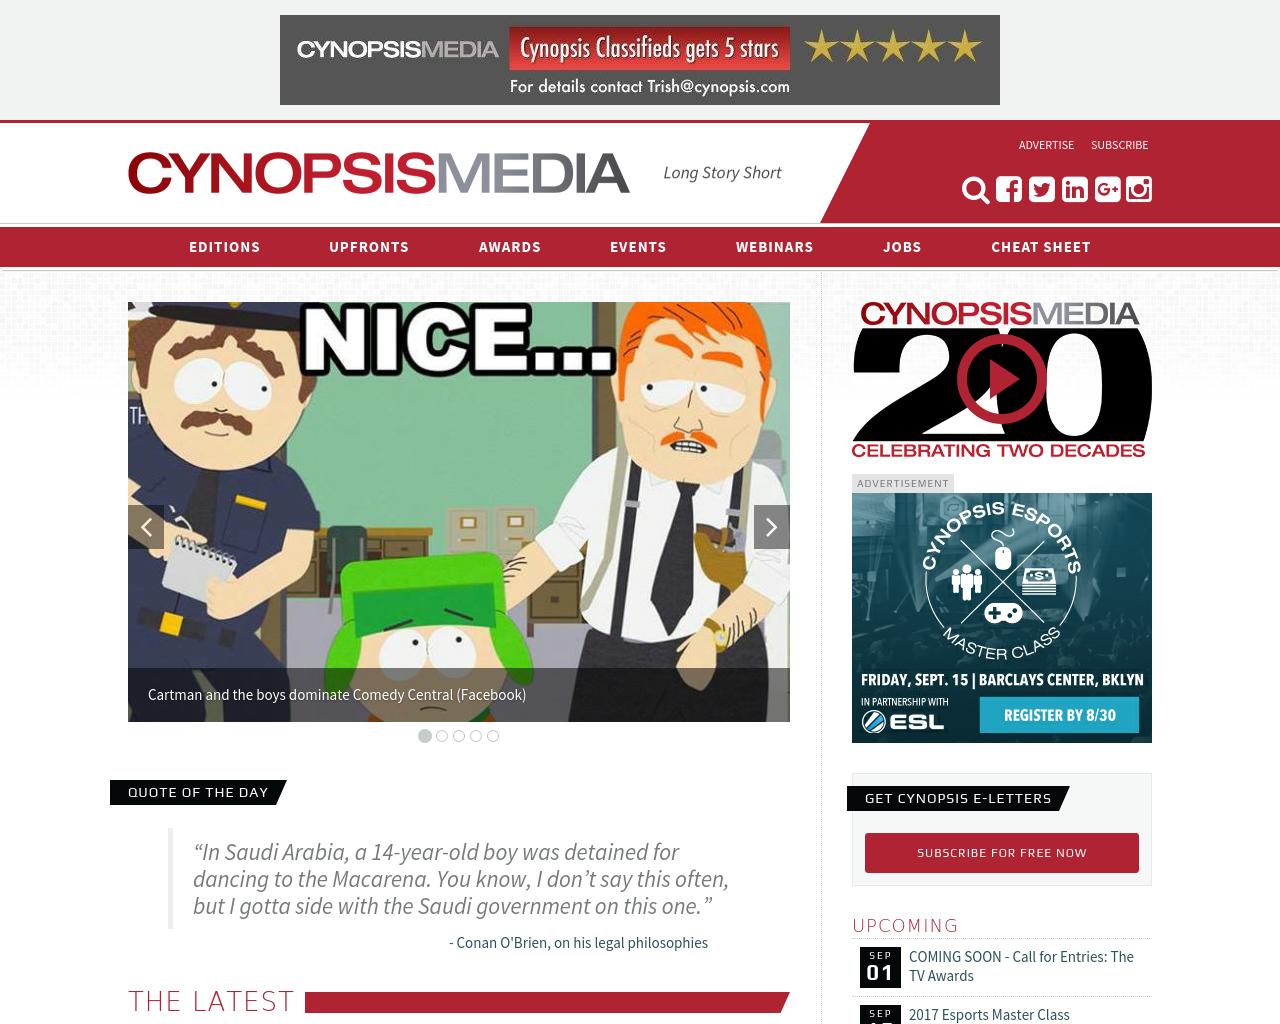 Cynopsis-Media-Advertising-Reviews-Pricing